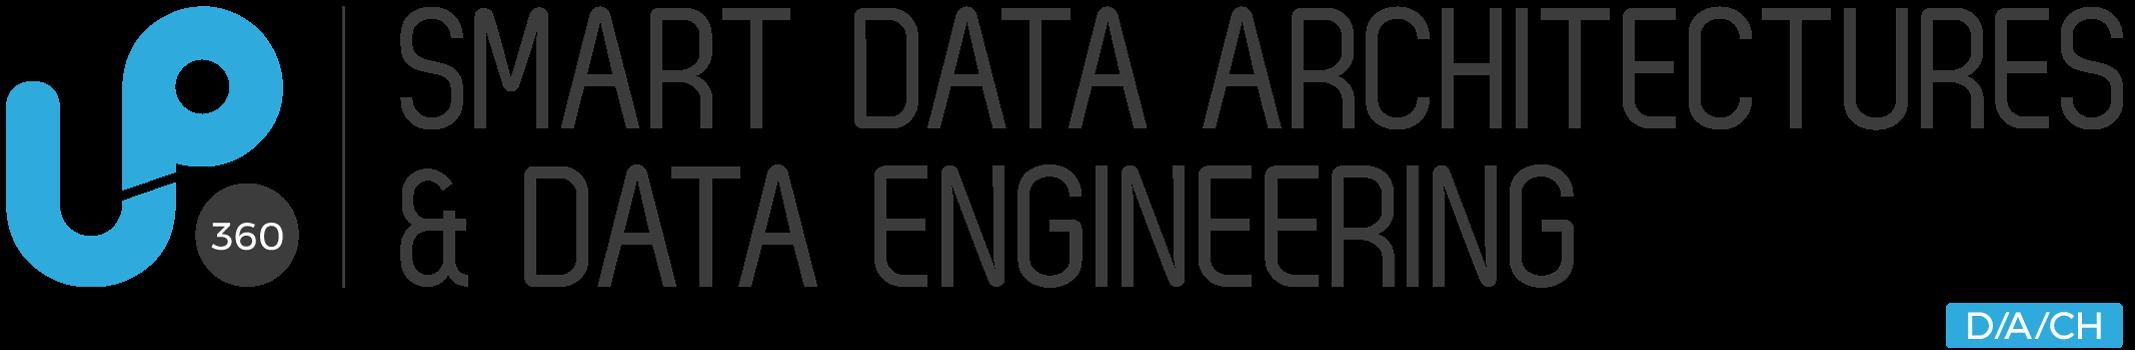 ScaleUp 360° Smart Data Architectures & Data Engineering DACH